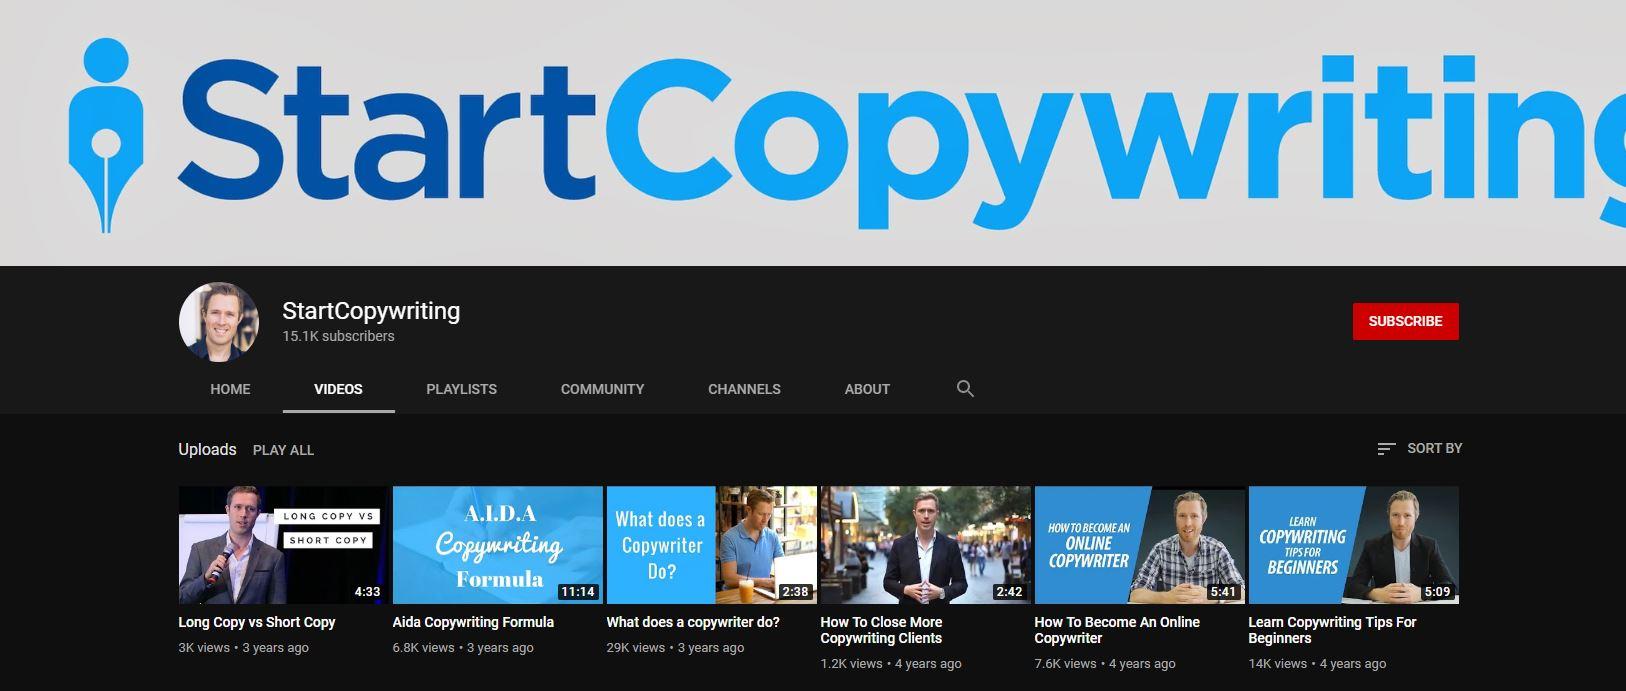 StartCopywriting YouTube